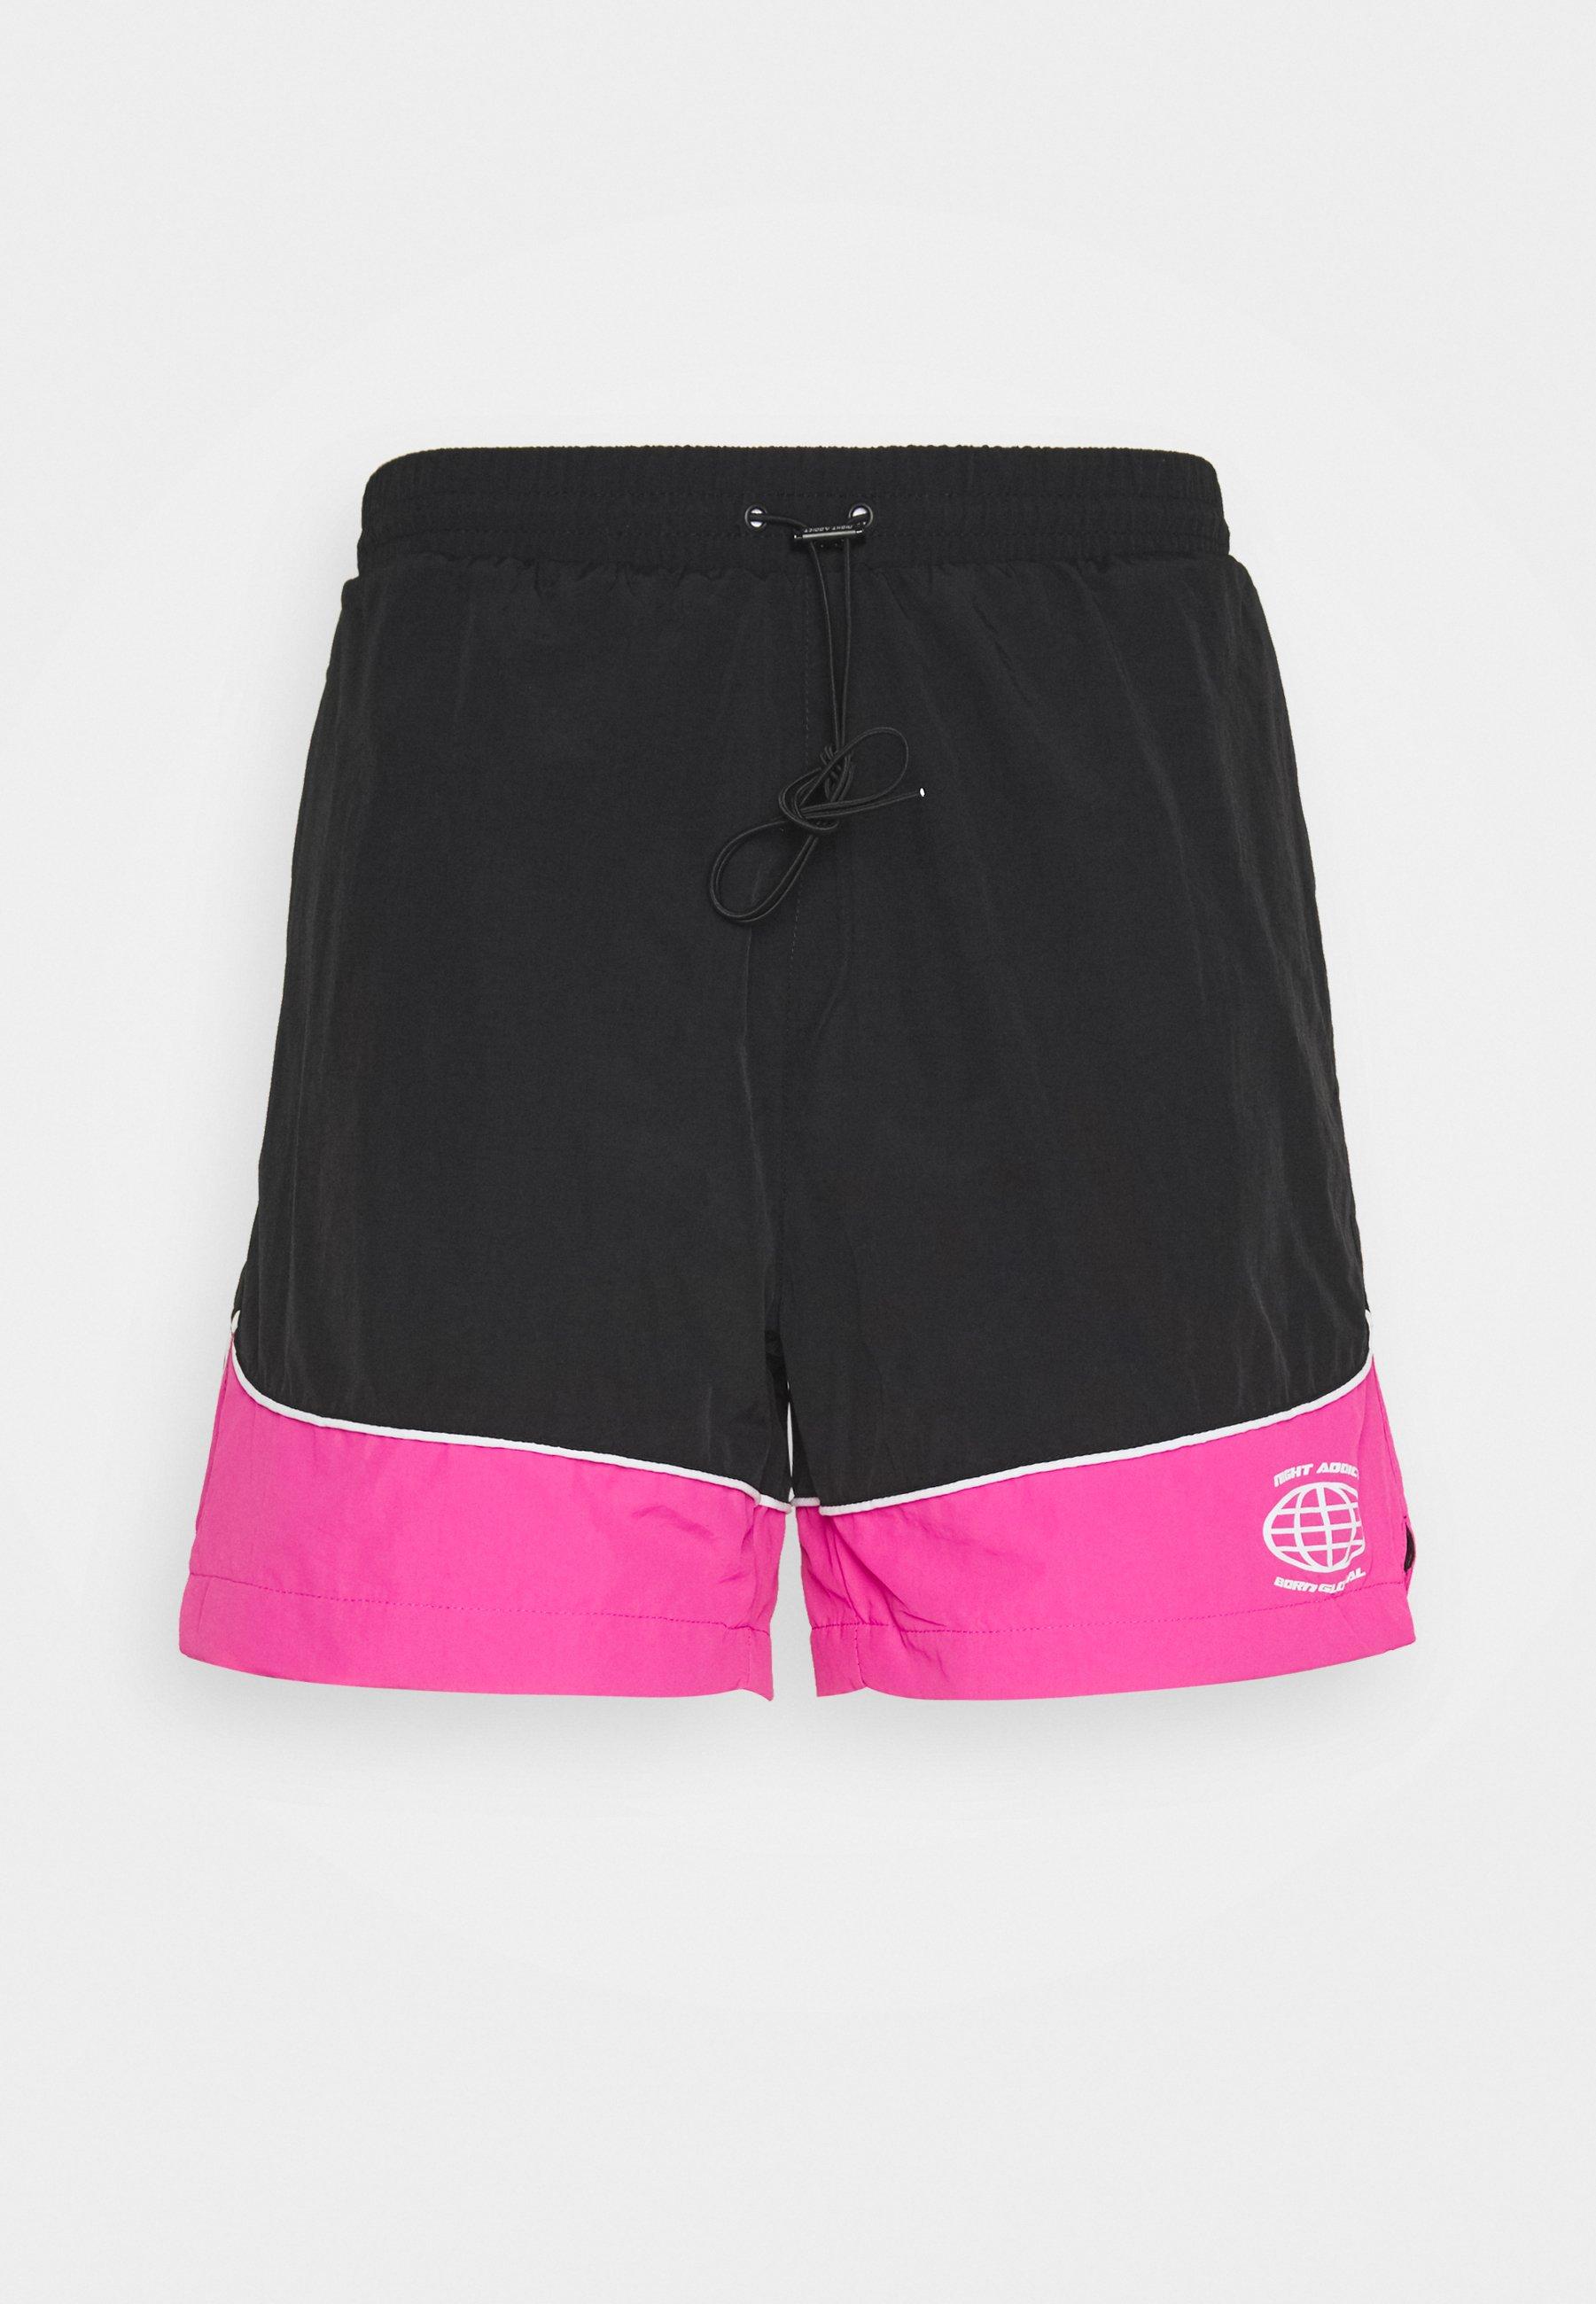 NAJOSHUA Shorts blackpink